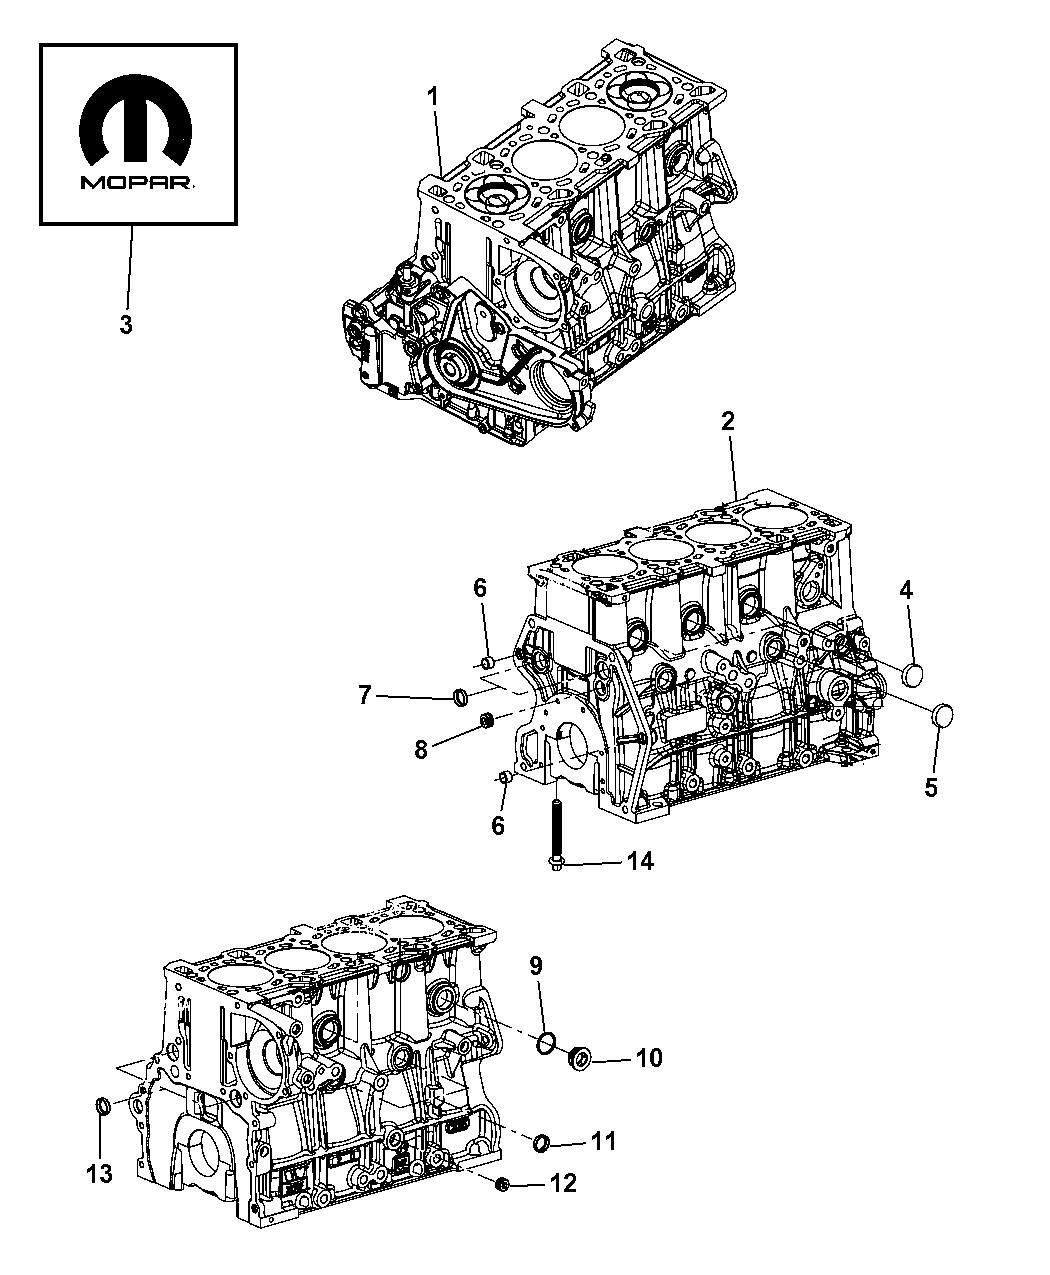 6 cylinder engine diagram 68044146aa - genuine jeep block-engine cylinder 6 cylinder engine diagram